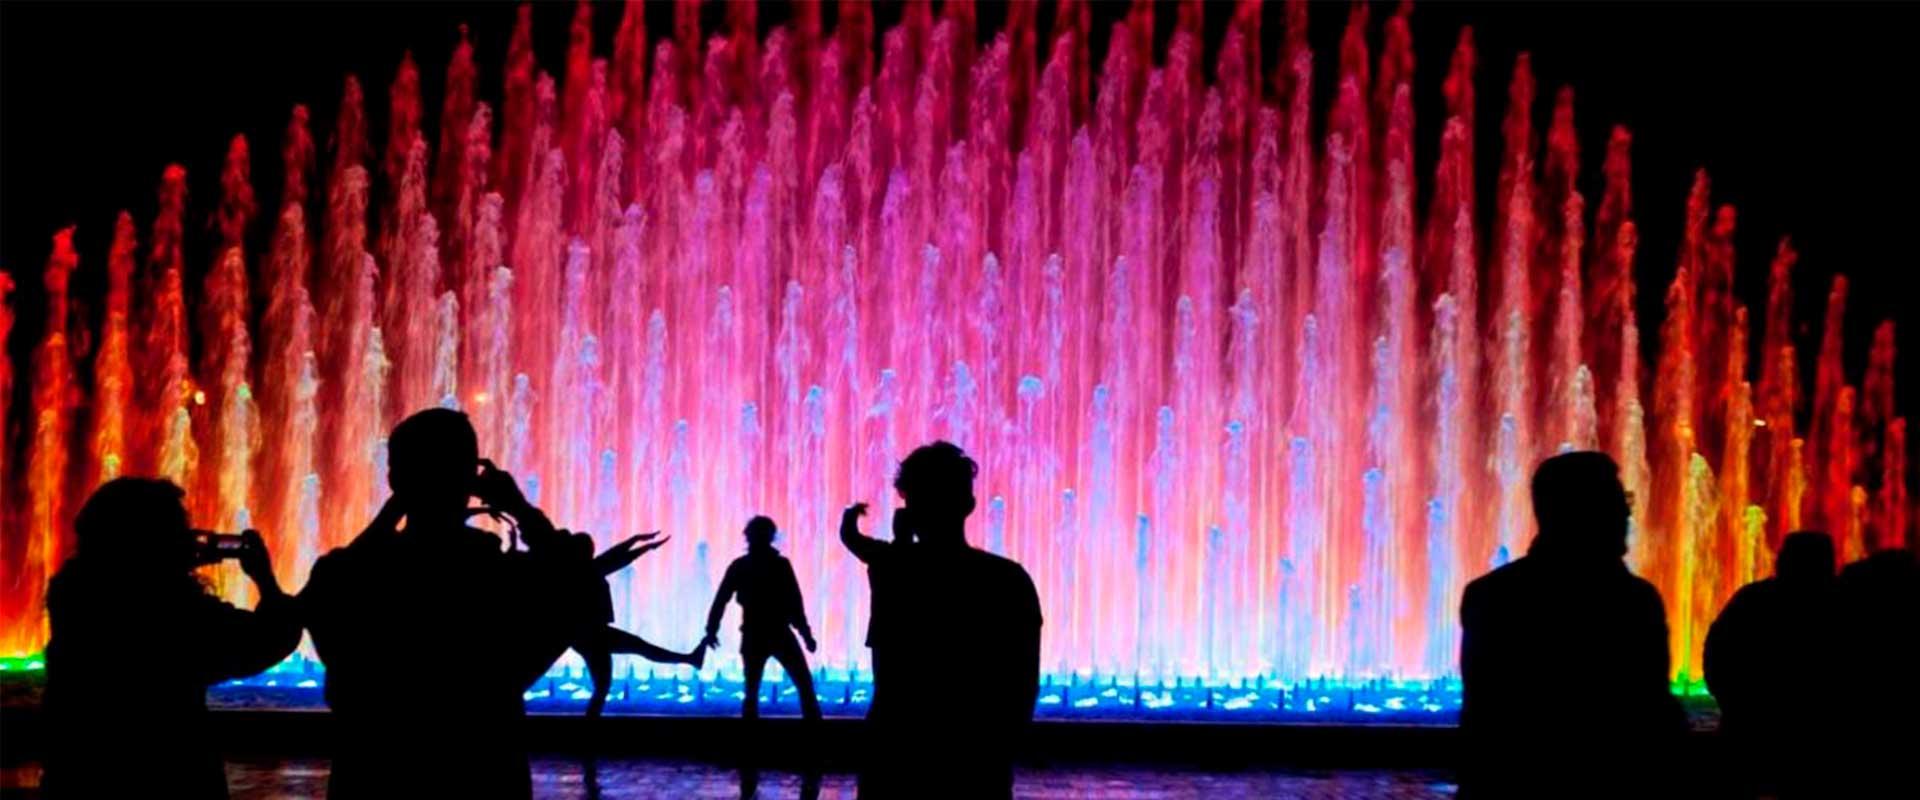 Lima Night Lights and Magic Water Circuit